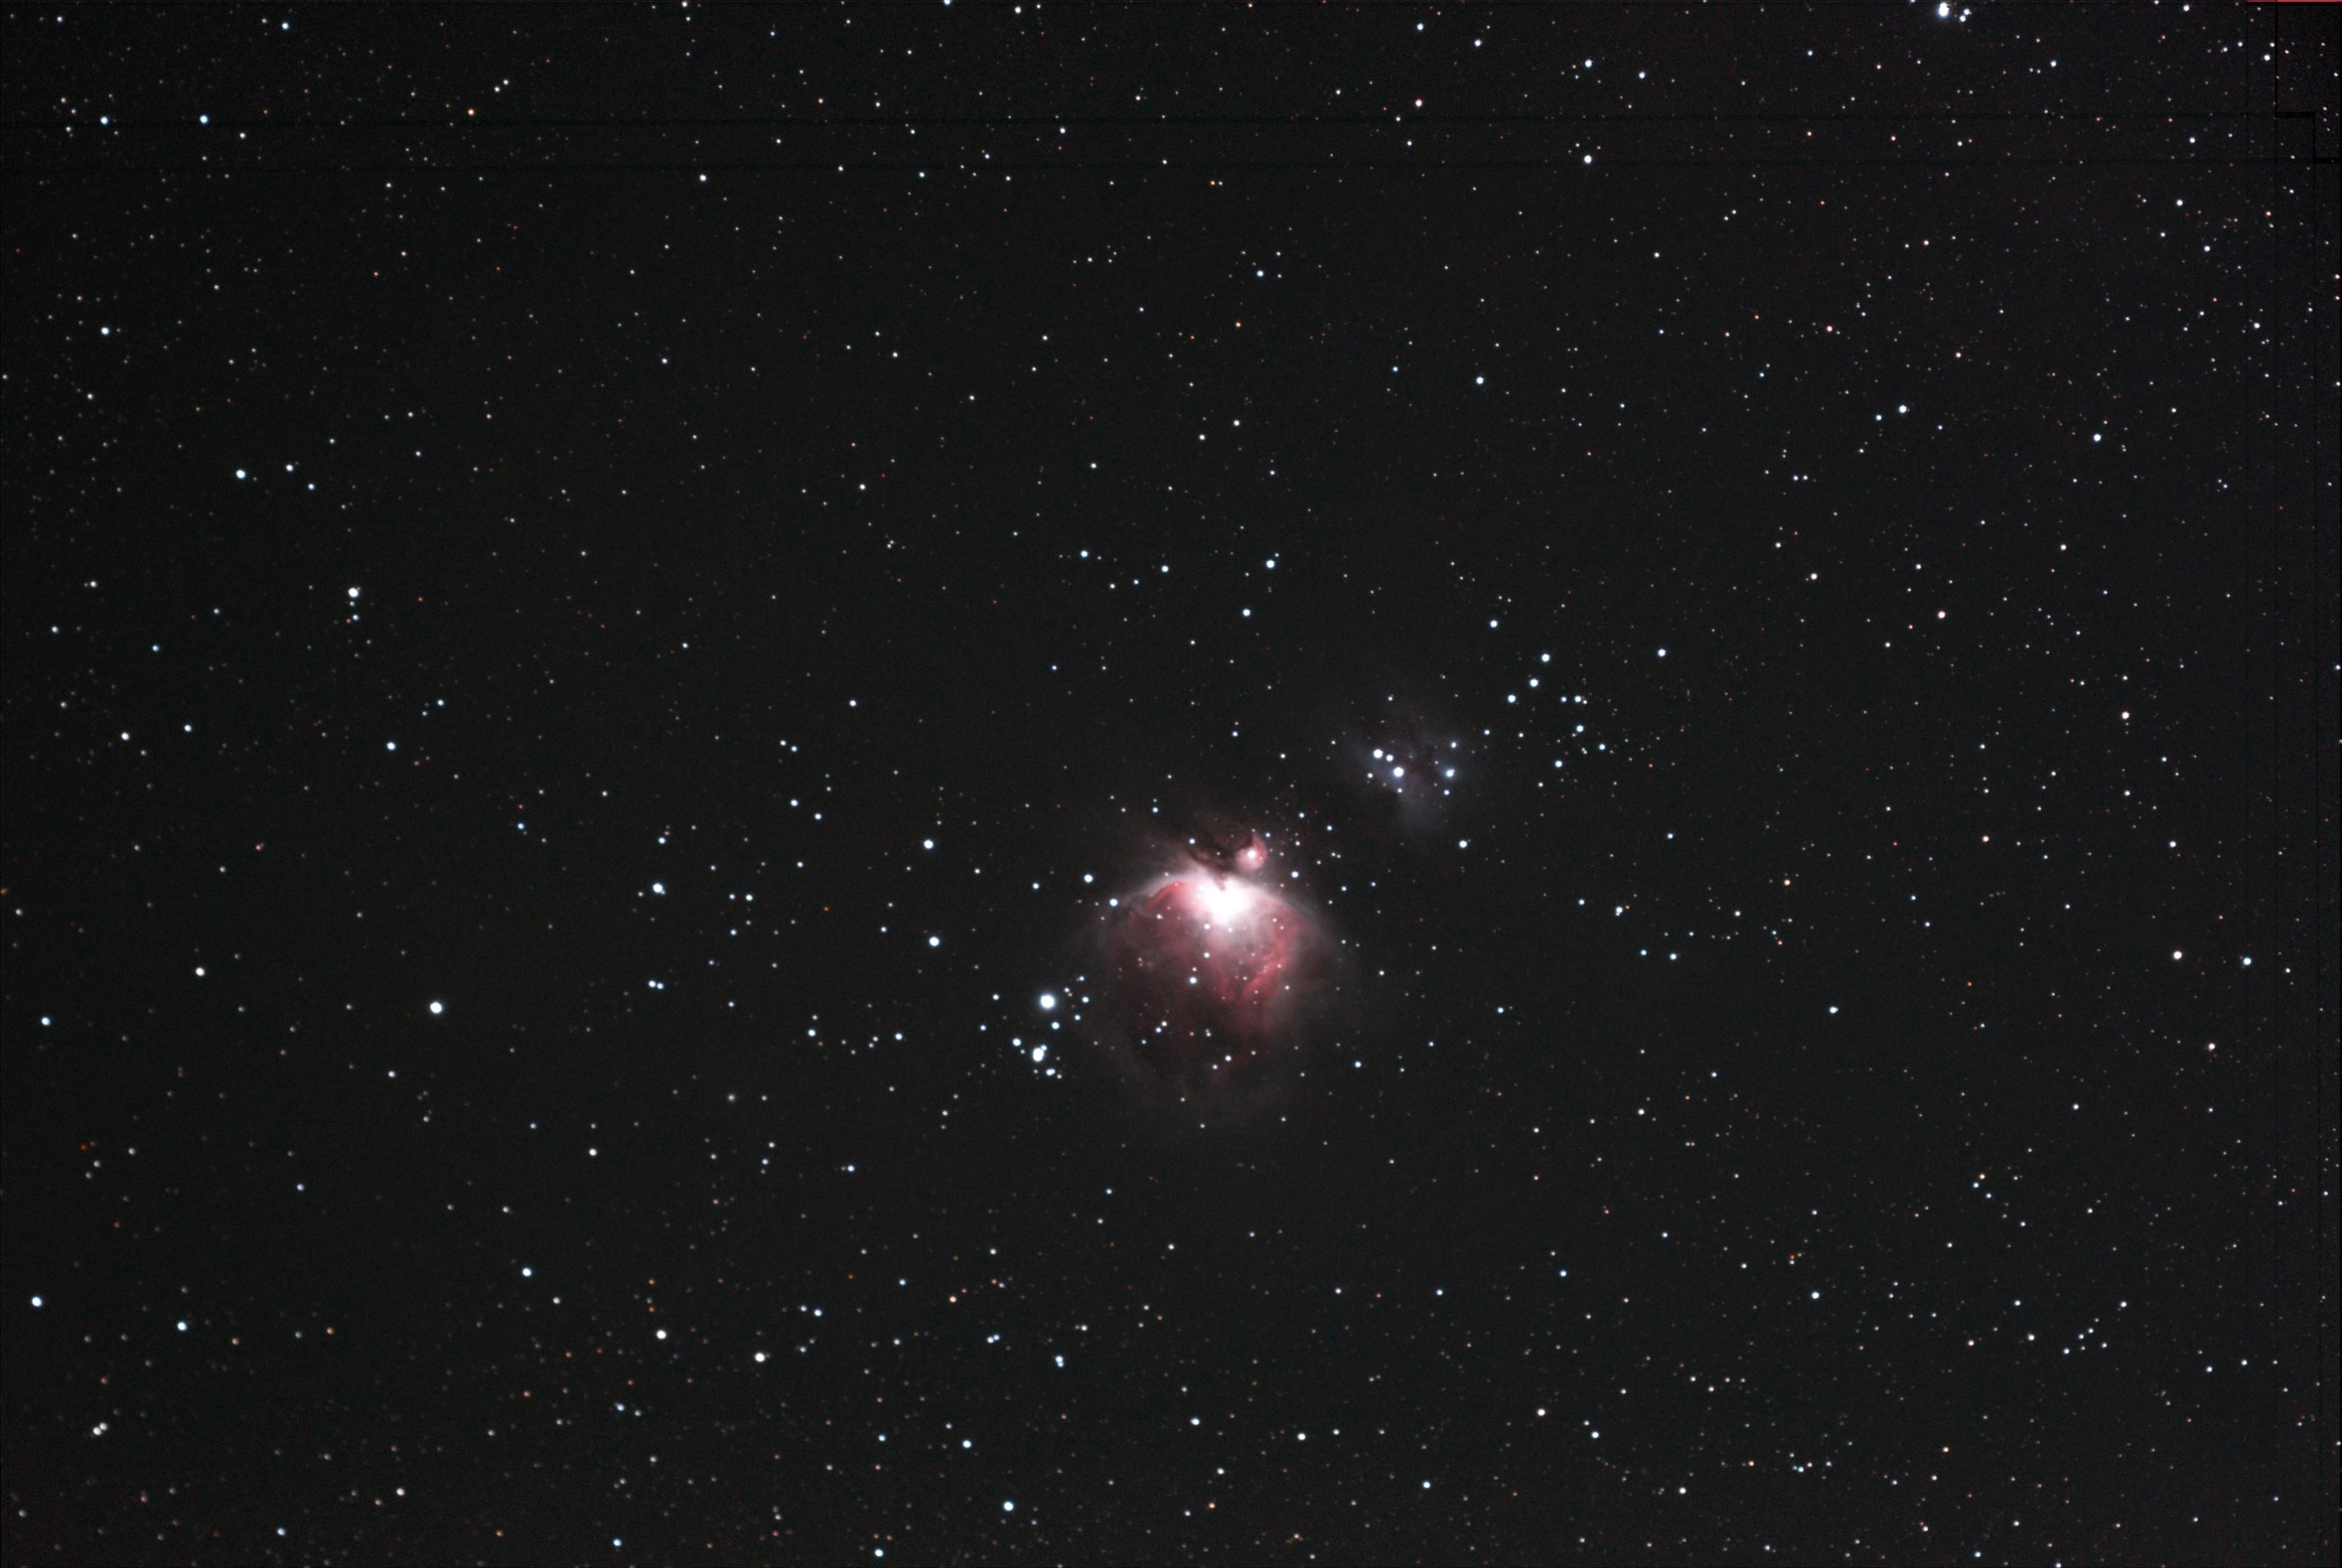 M42-6400-3680x2464.jpg